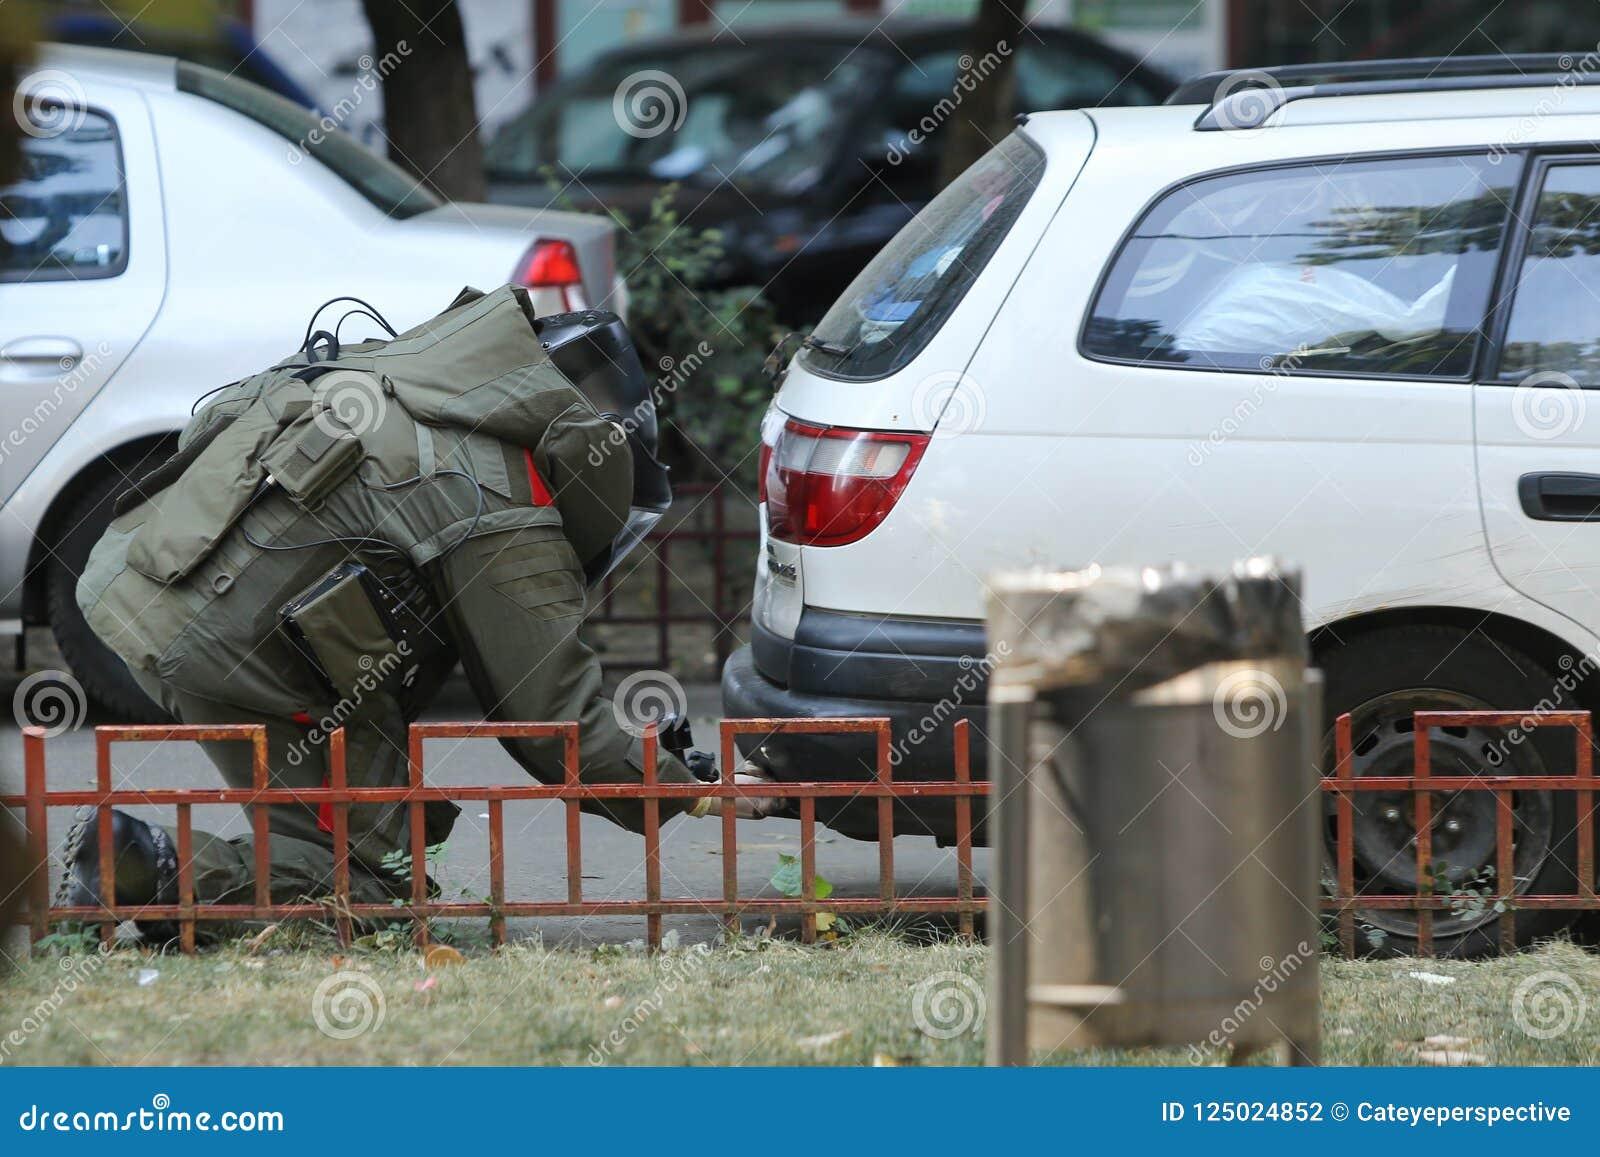 bomb-disposal-expert-suit-explosive-ordnance-disposa-bucharest-romania-august-eod-verifying-suspect-car-street-125024852.jpg